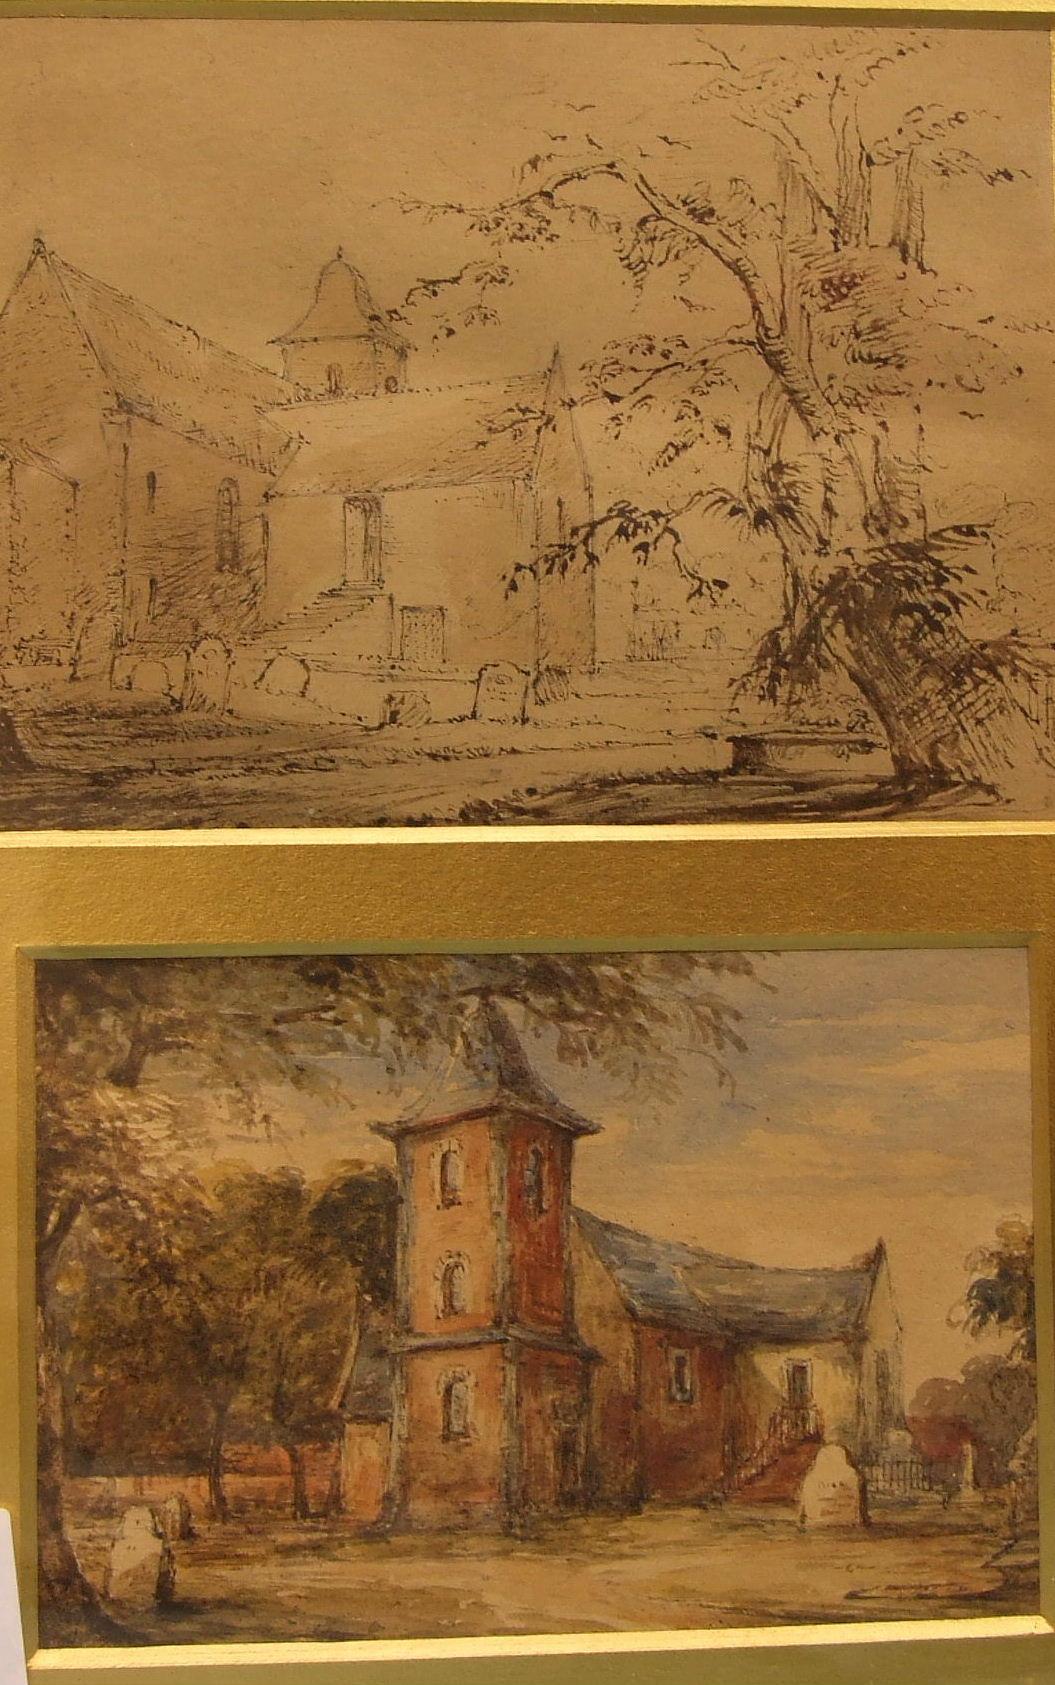 Lot 235 - 19th century English School, 'North Berwick Parish Church', pen and ink drawing, 10 x 13cm,